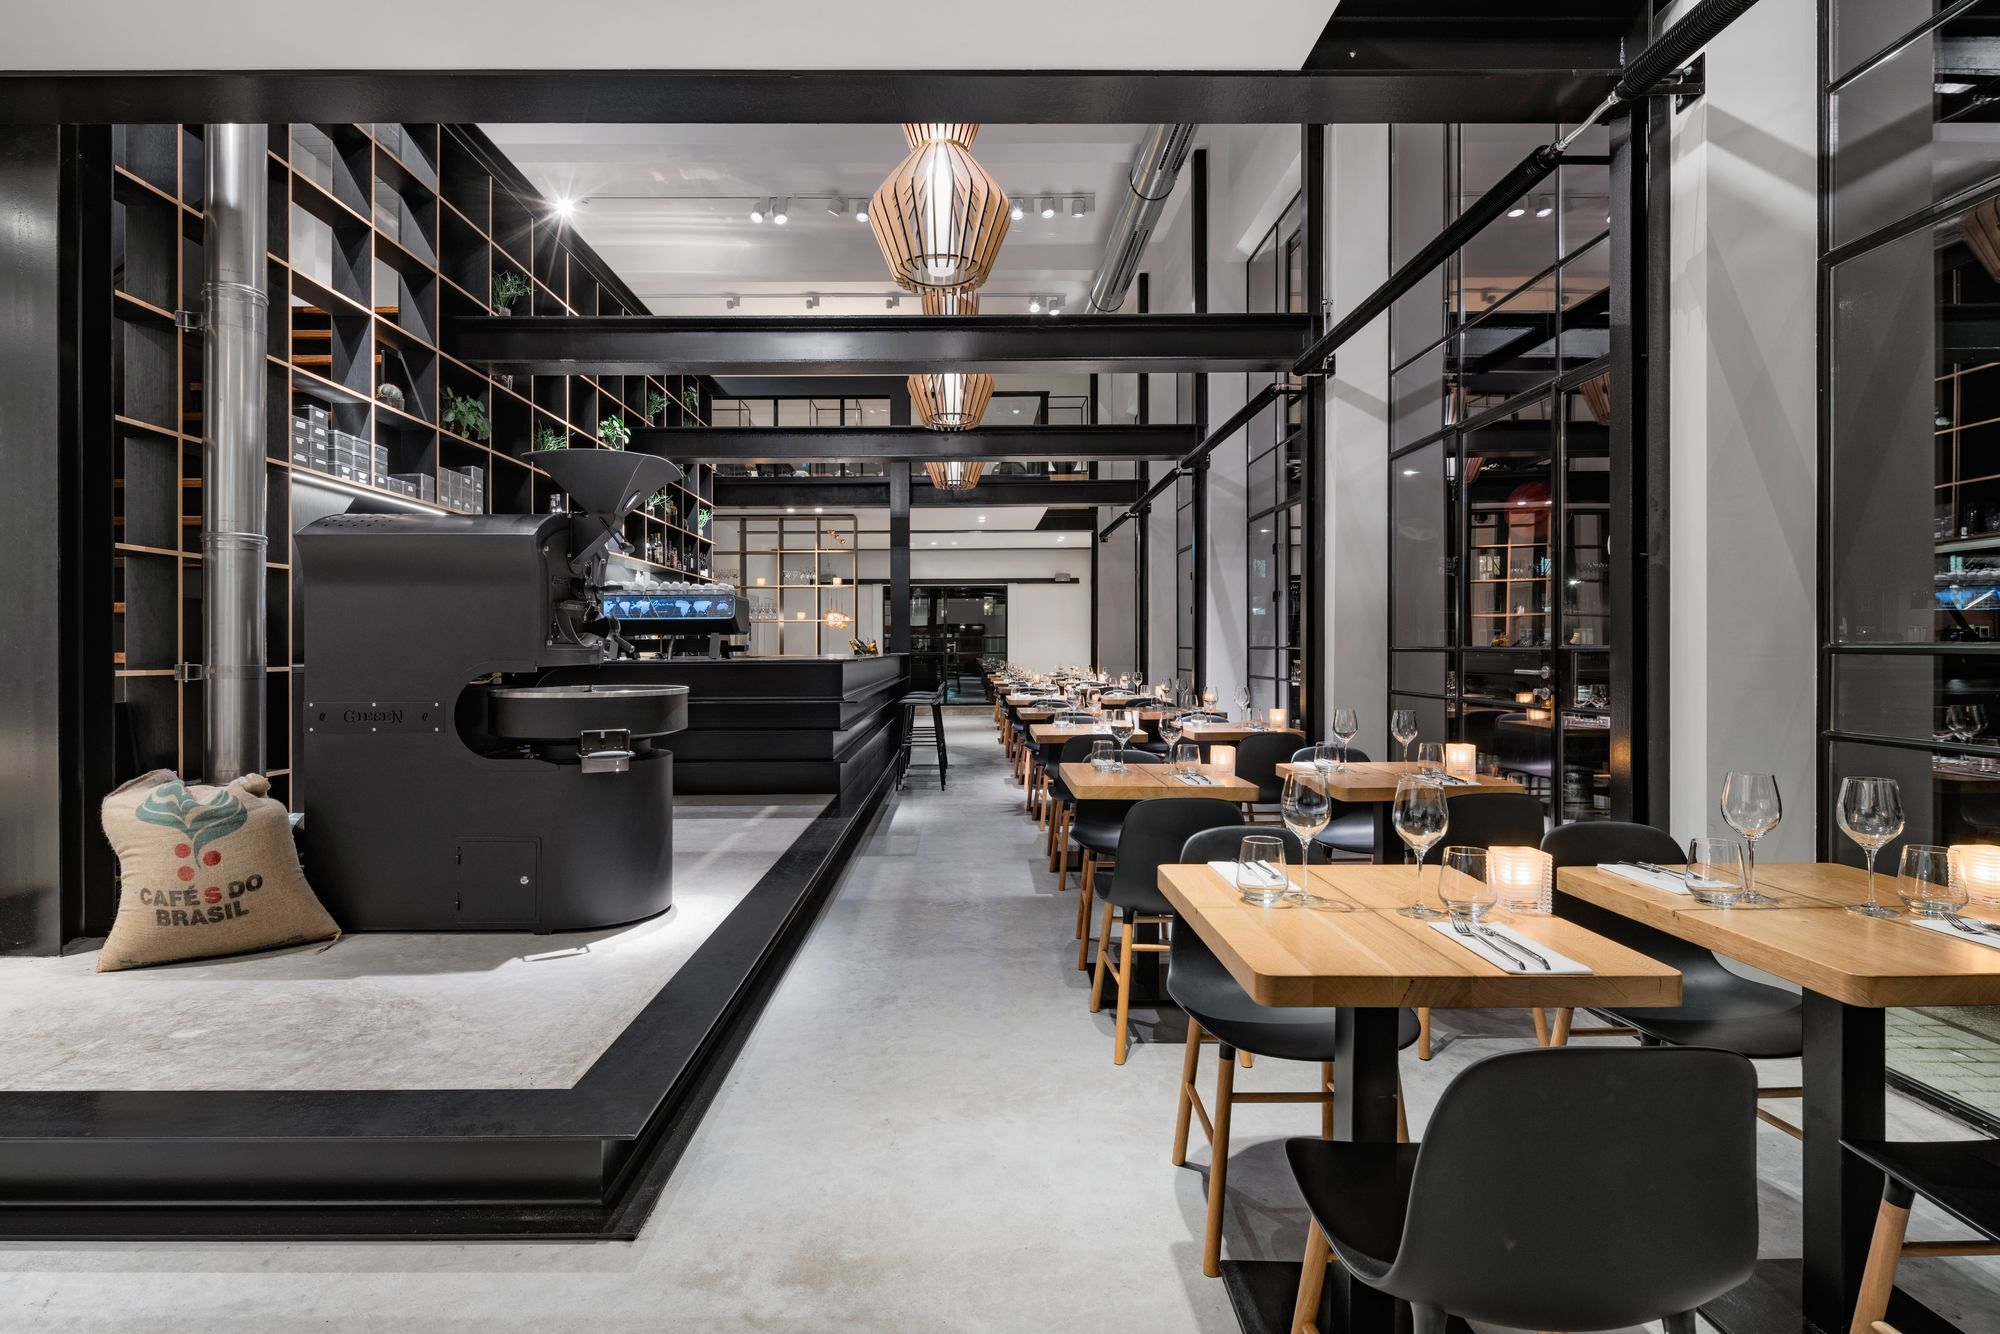 Wohndesign innenraum capriole café  bureau fraai  interior  pinterest  café